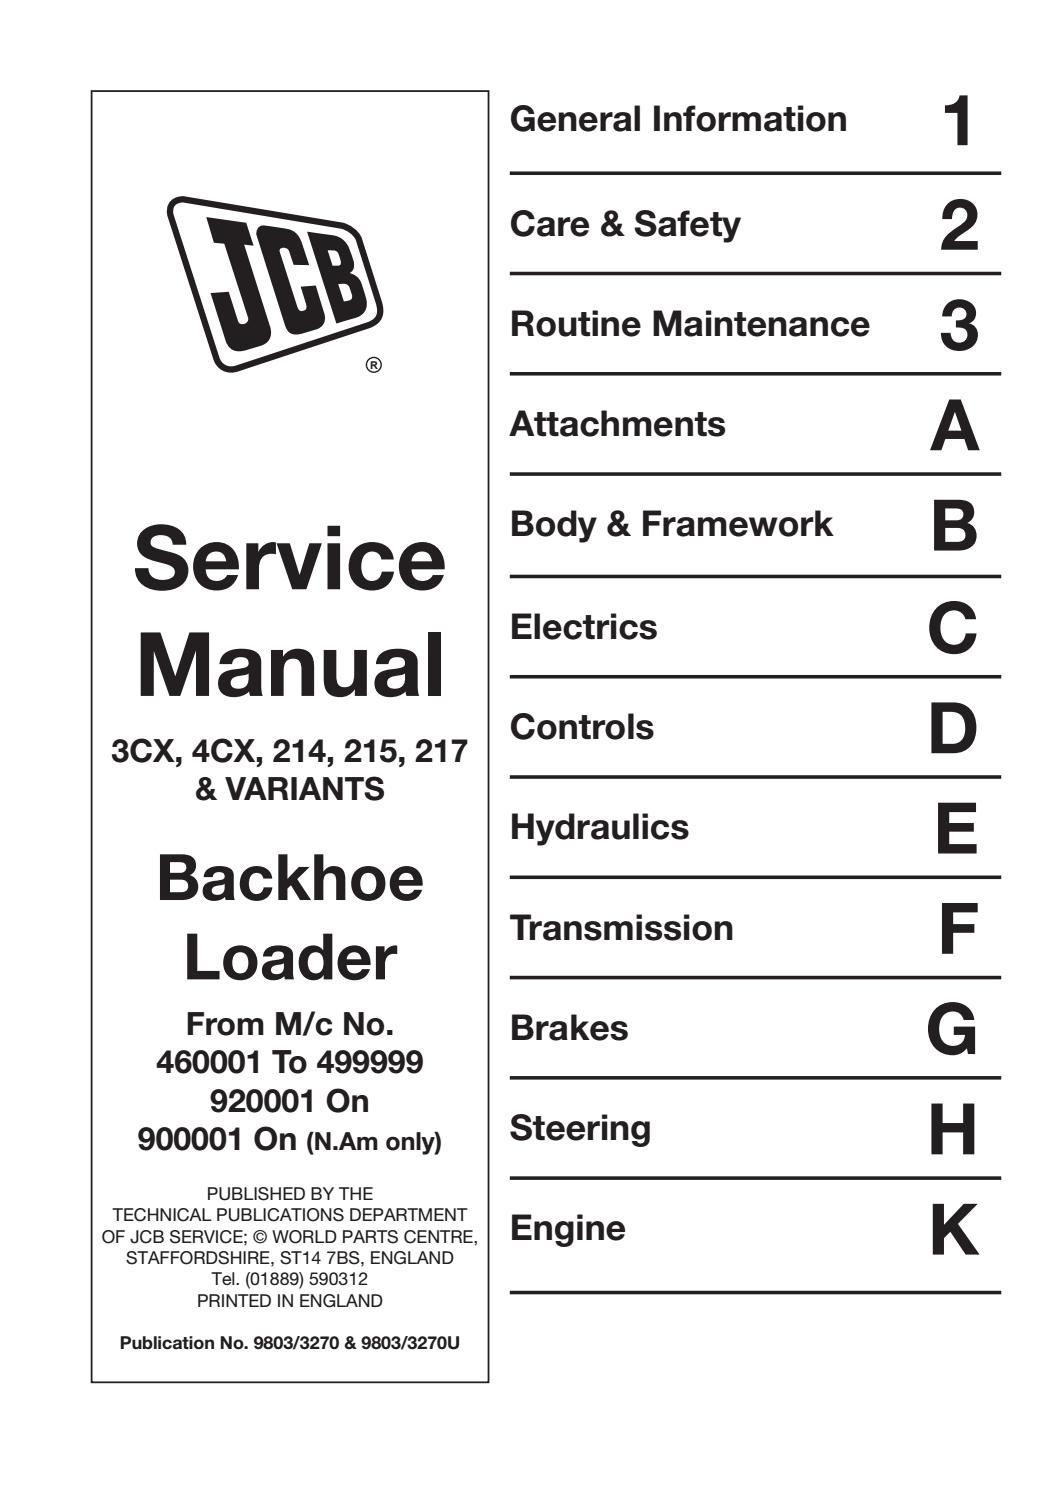 JCB 3CX, 4CX, 214, 215, 217 & Variants Backhoe Loader Service Repair